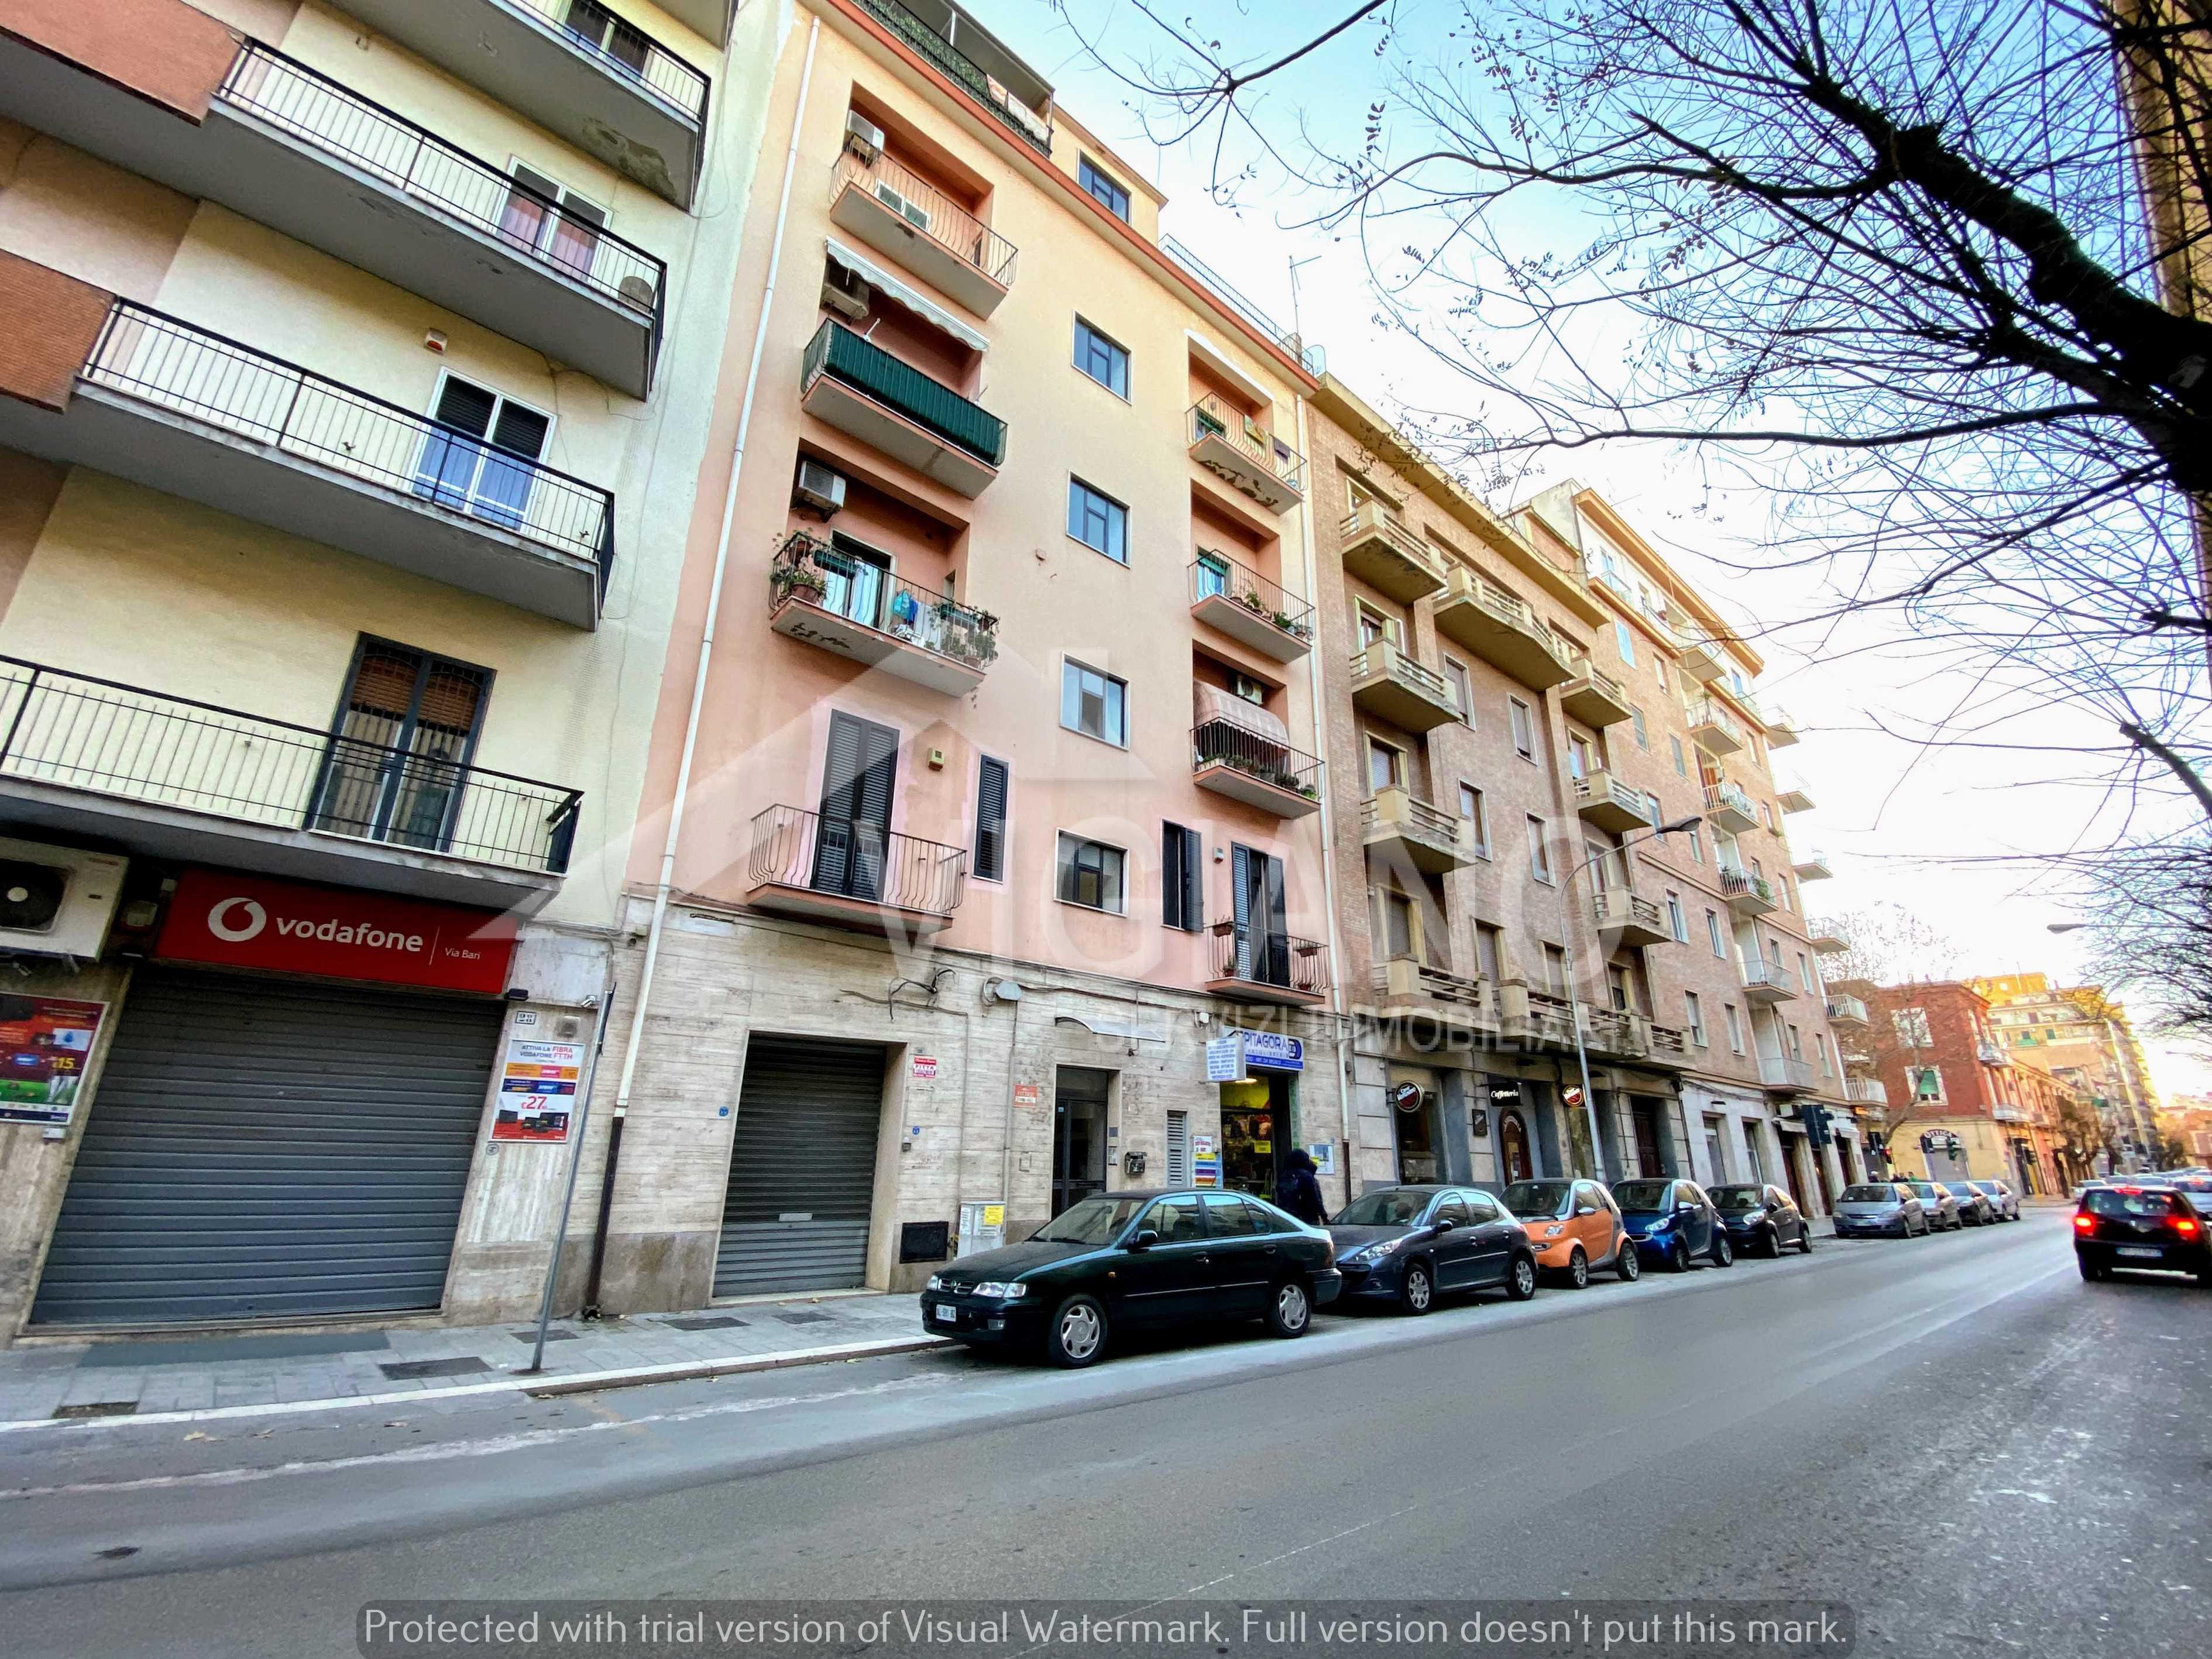 Via Bari